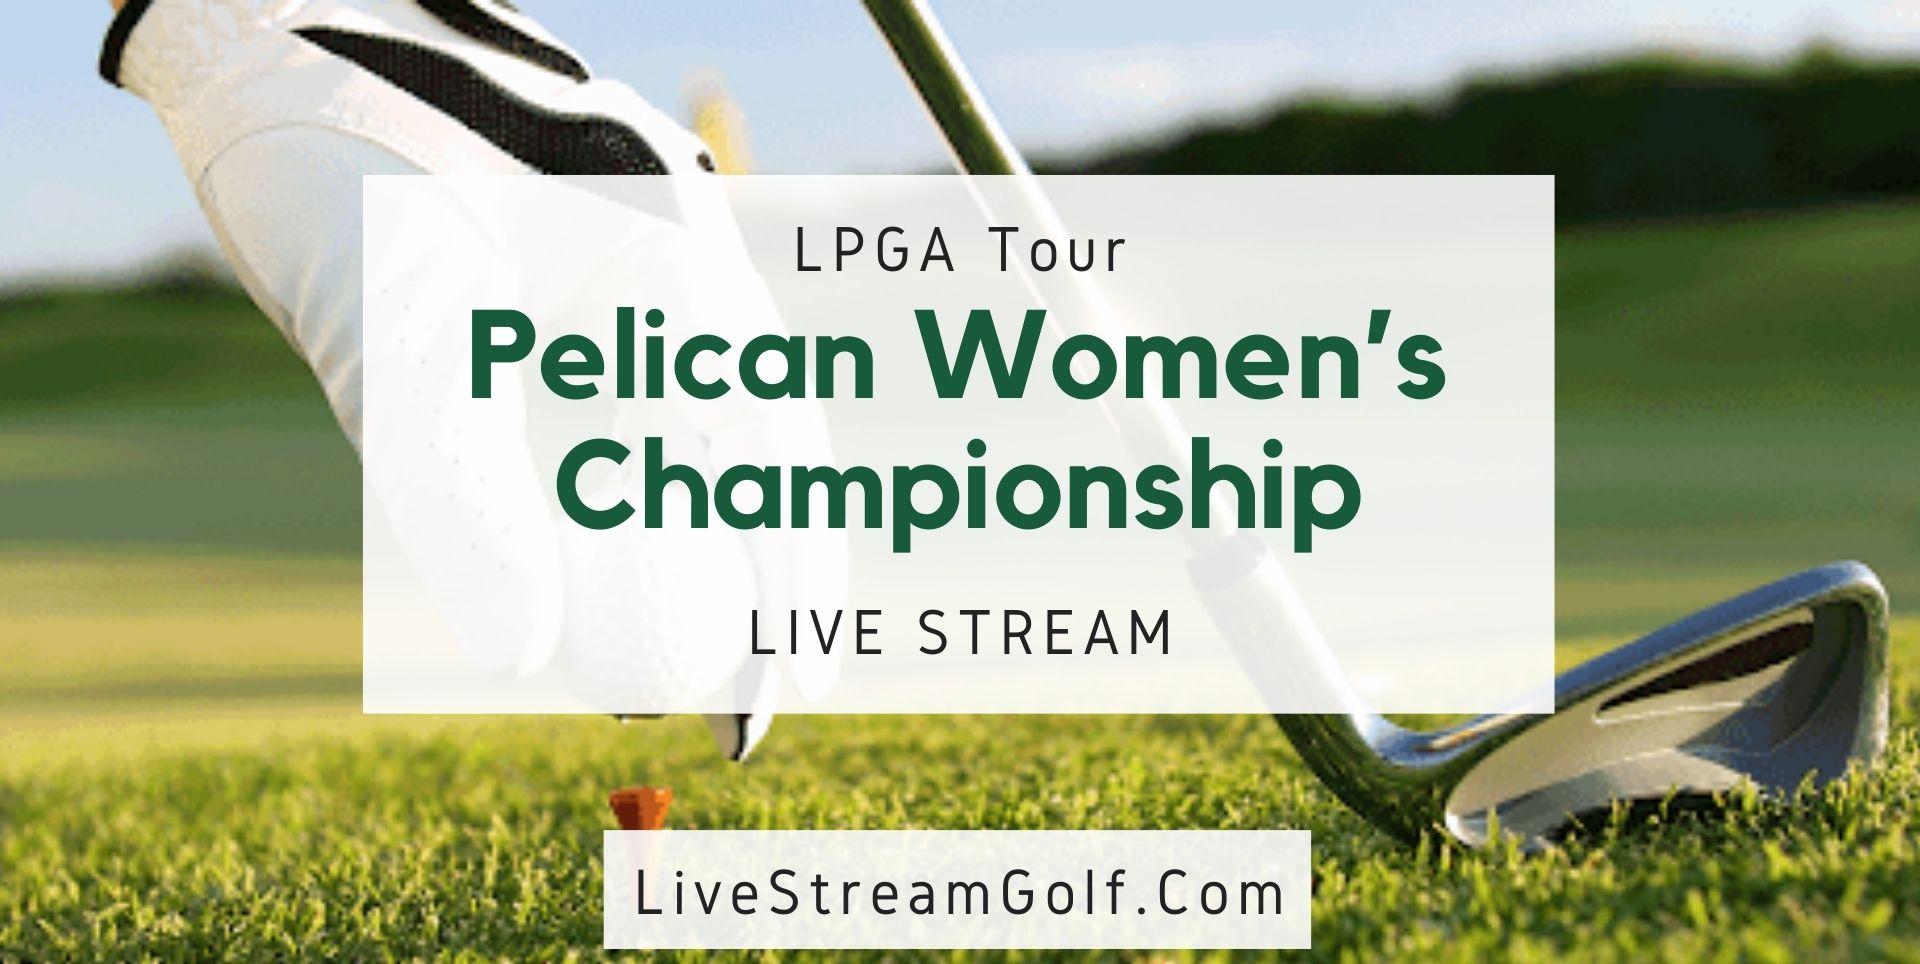 Pelican Women's Championship Rd 2 Live Stream: LPGA 2021